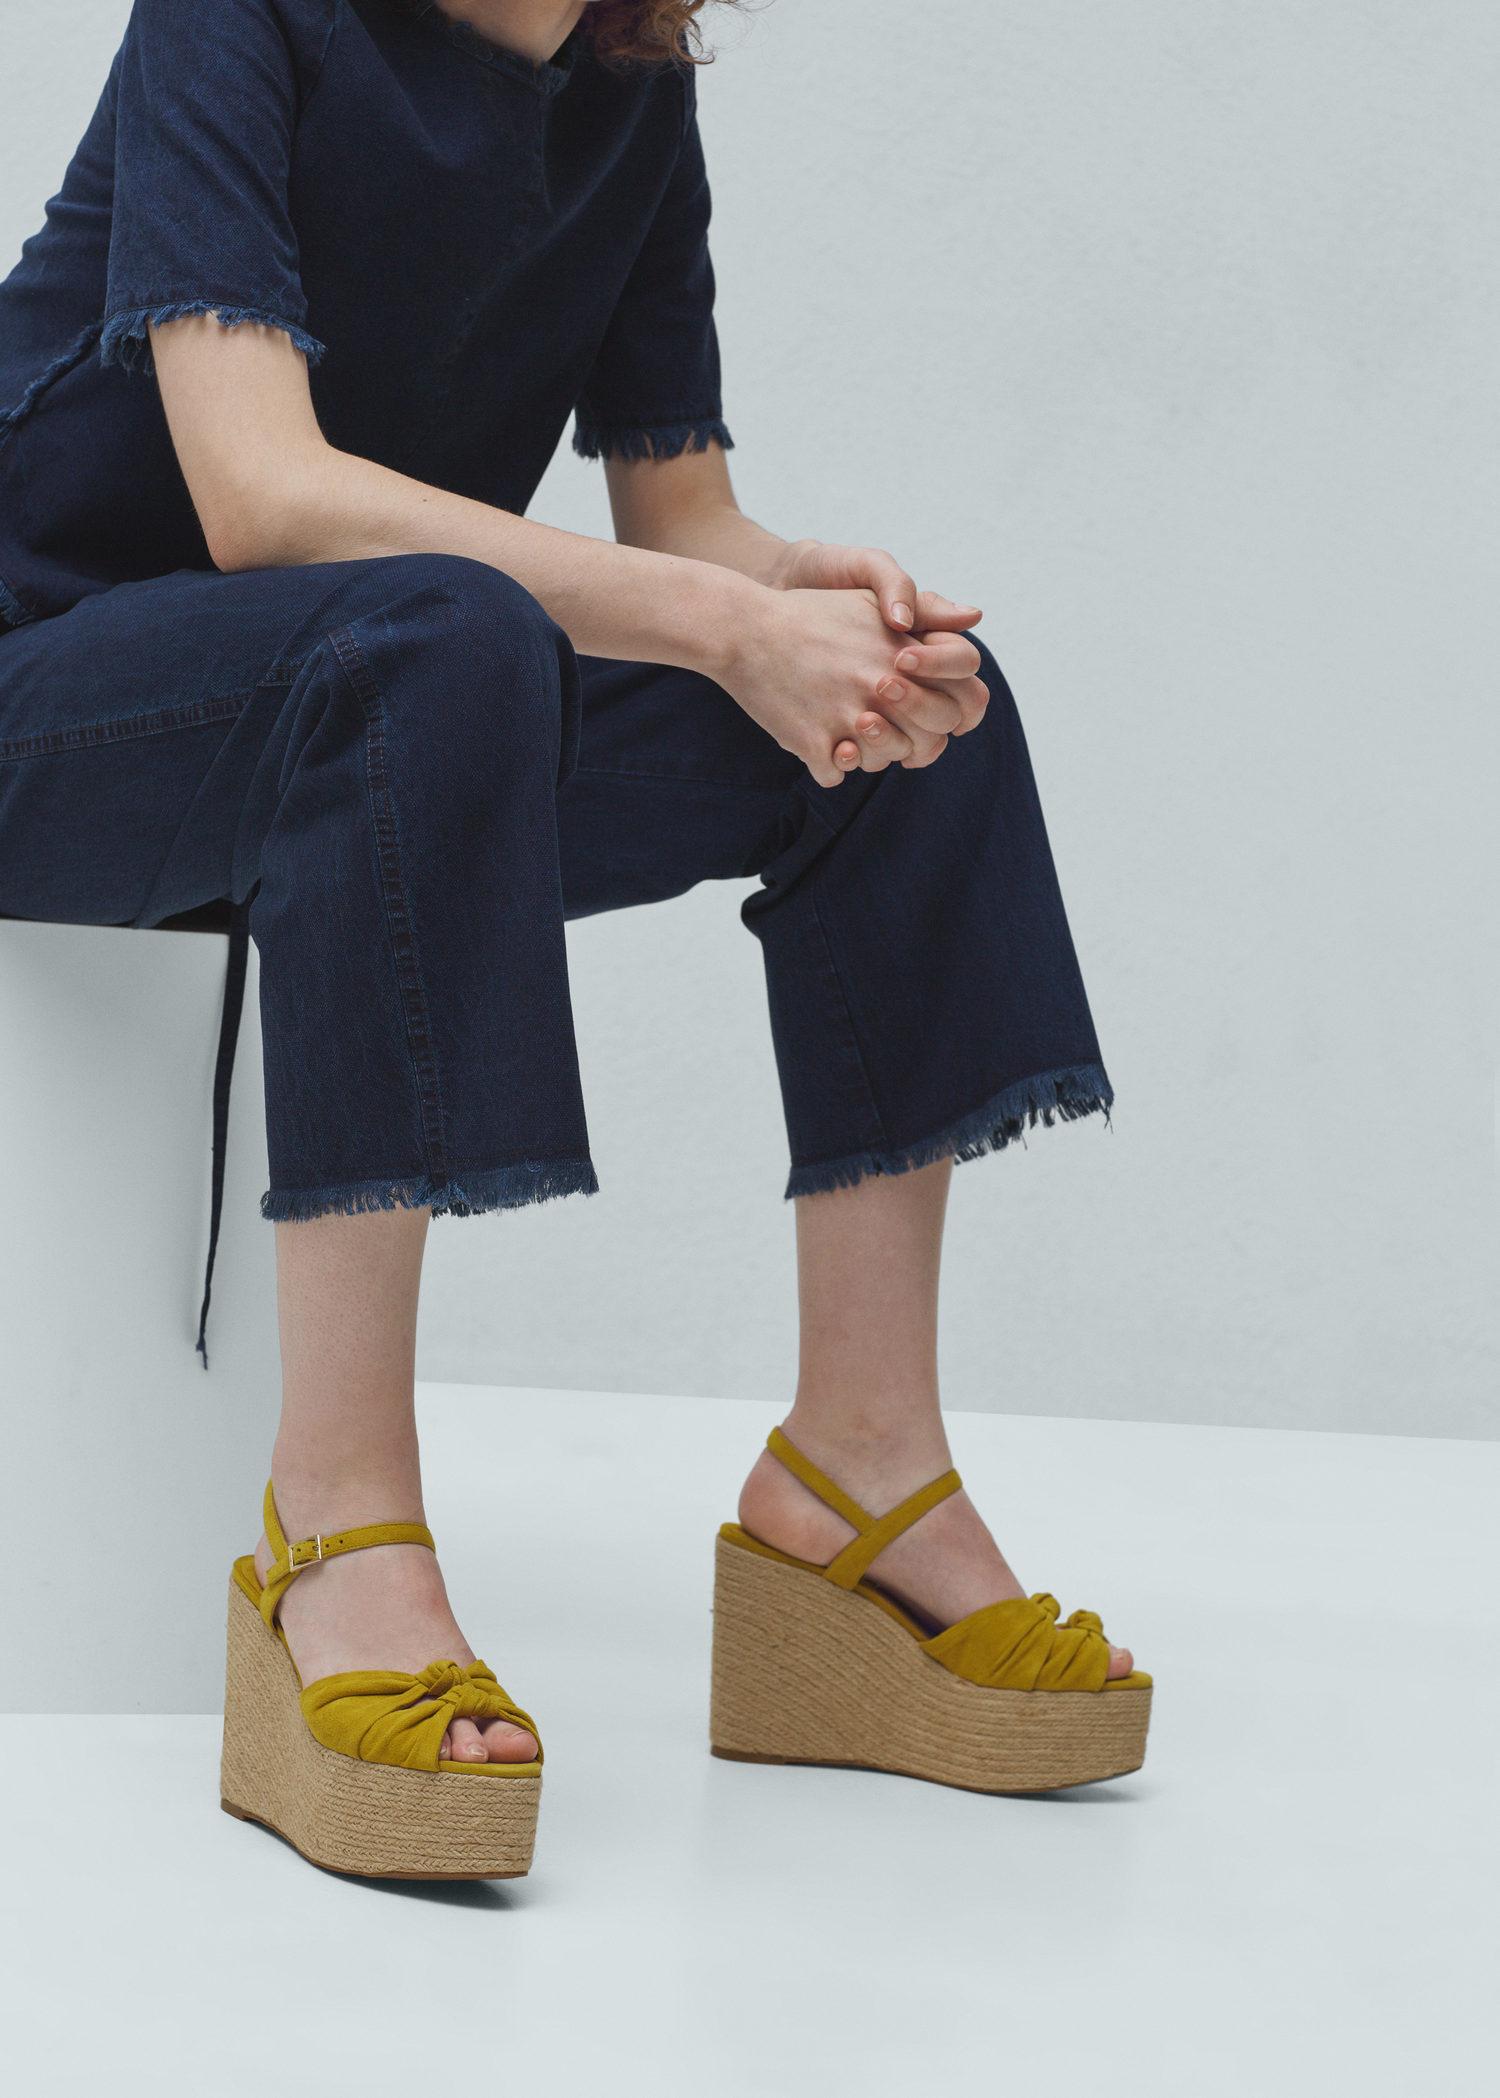 70140da345 Mango Platform Leather Sandals in Yellow - Lyst